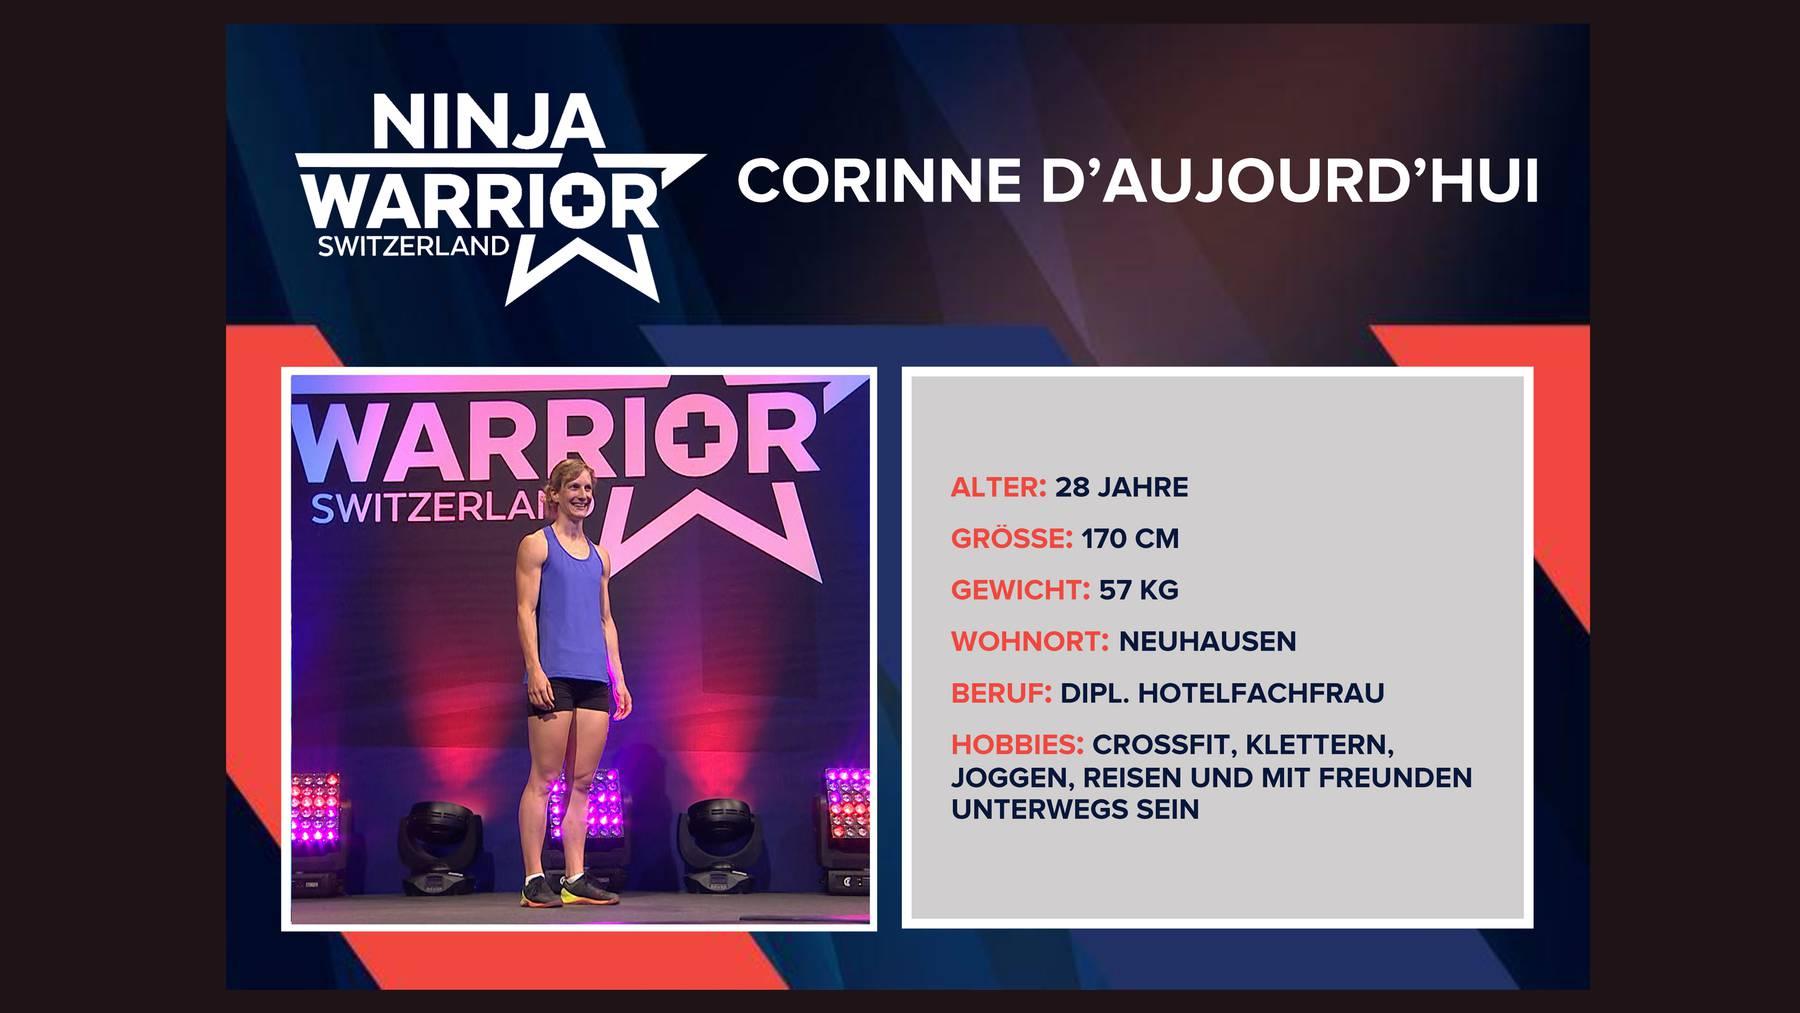 Corinne d'Aujourdhui